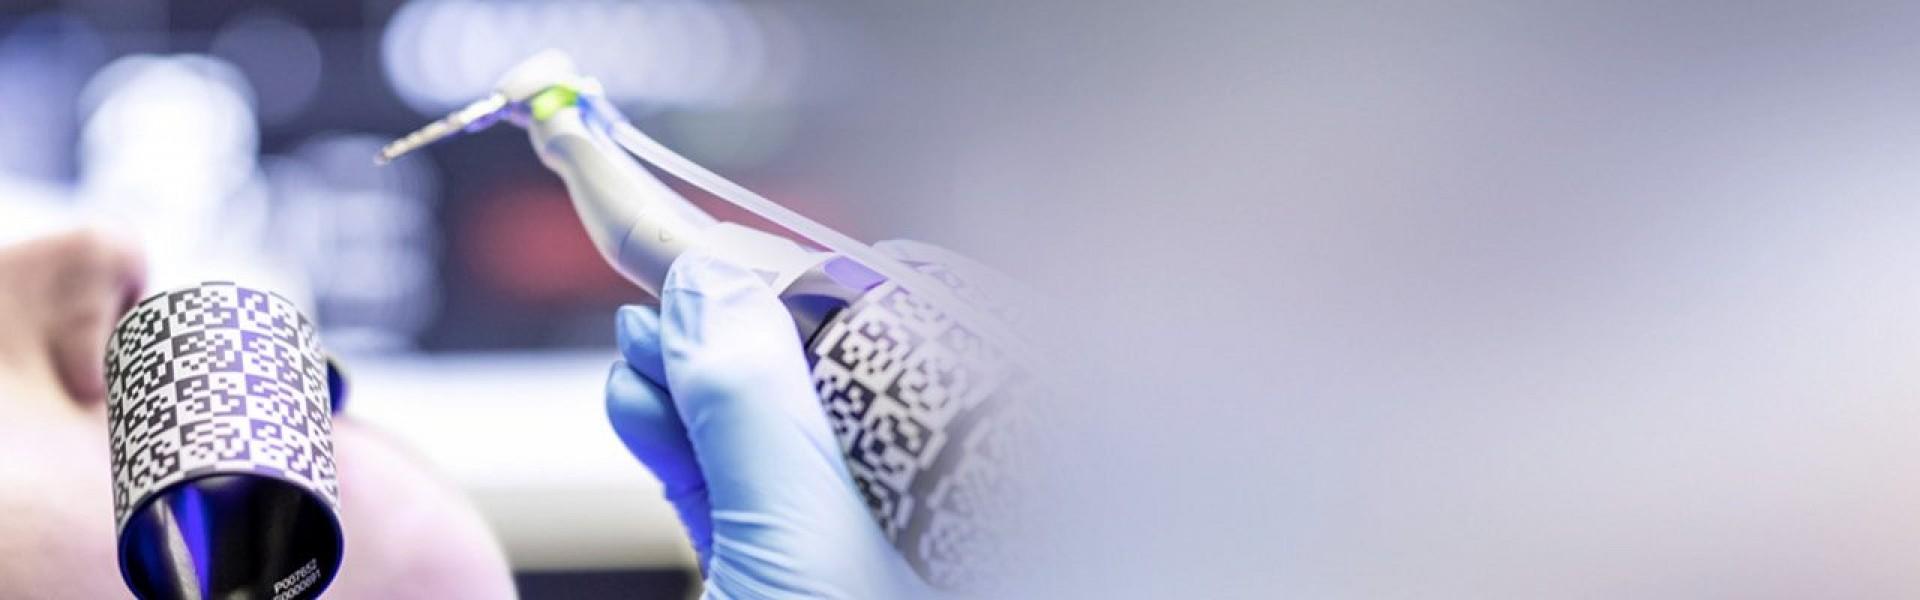 Digital implantology